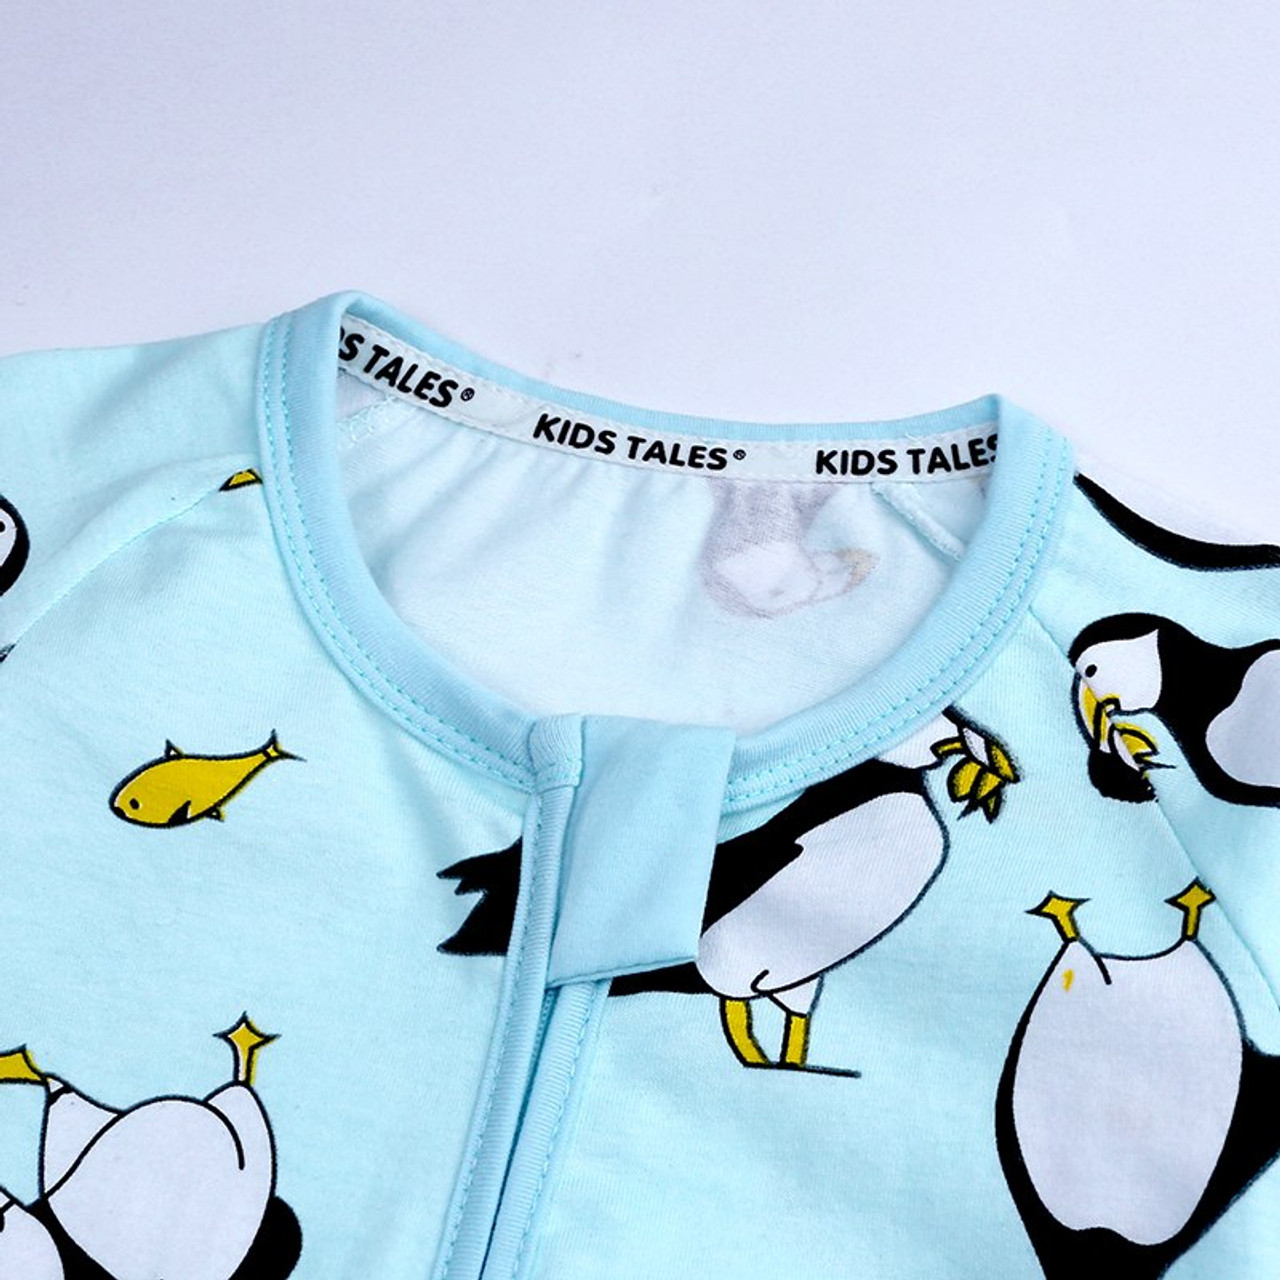 for Baby Toddler Boy or Girl Zippered Romper Penguin Print Blue Jumpsuit Long Sleeve